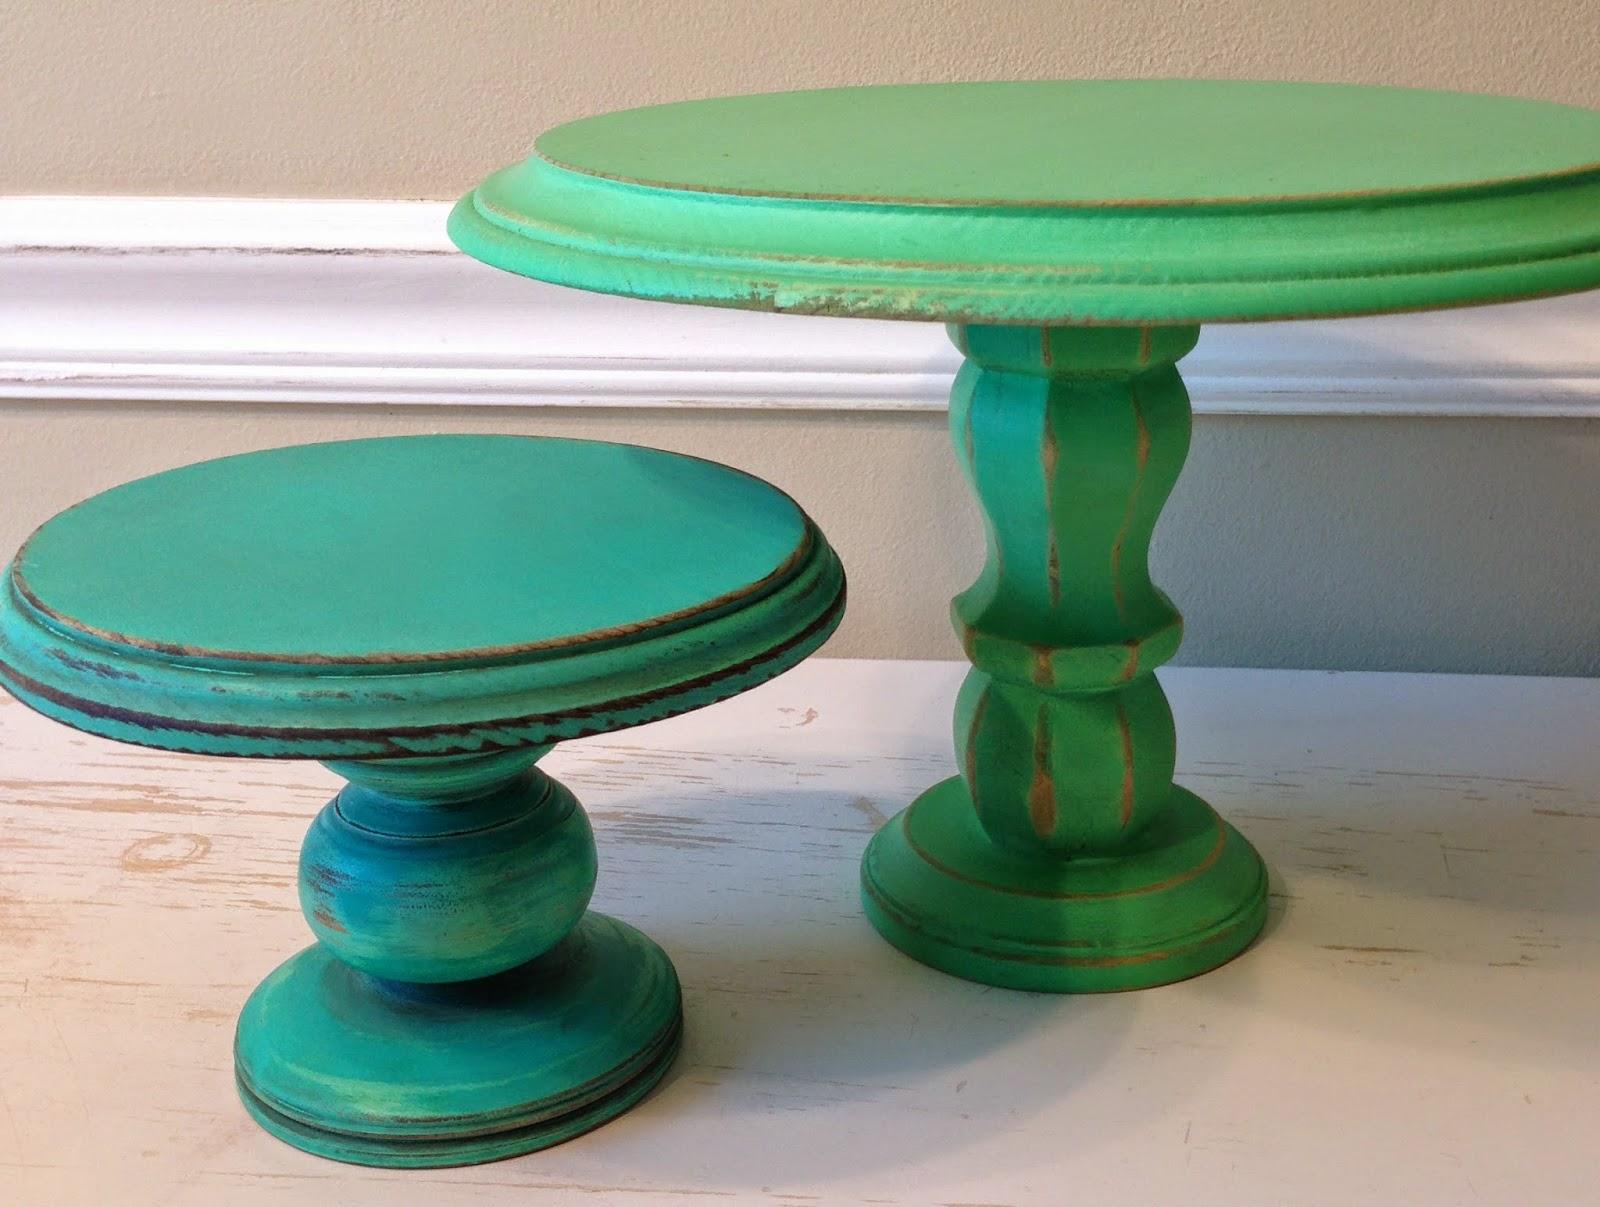 Diy Wooden Stands ~ Bumbledo diy wooden cake stands